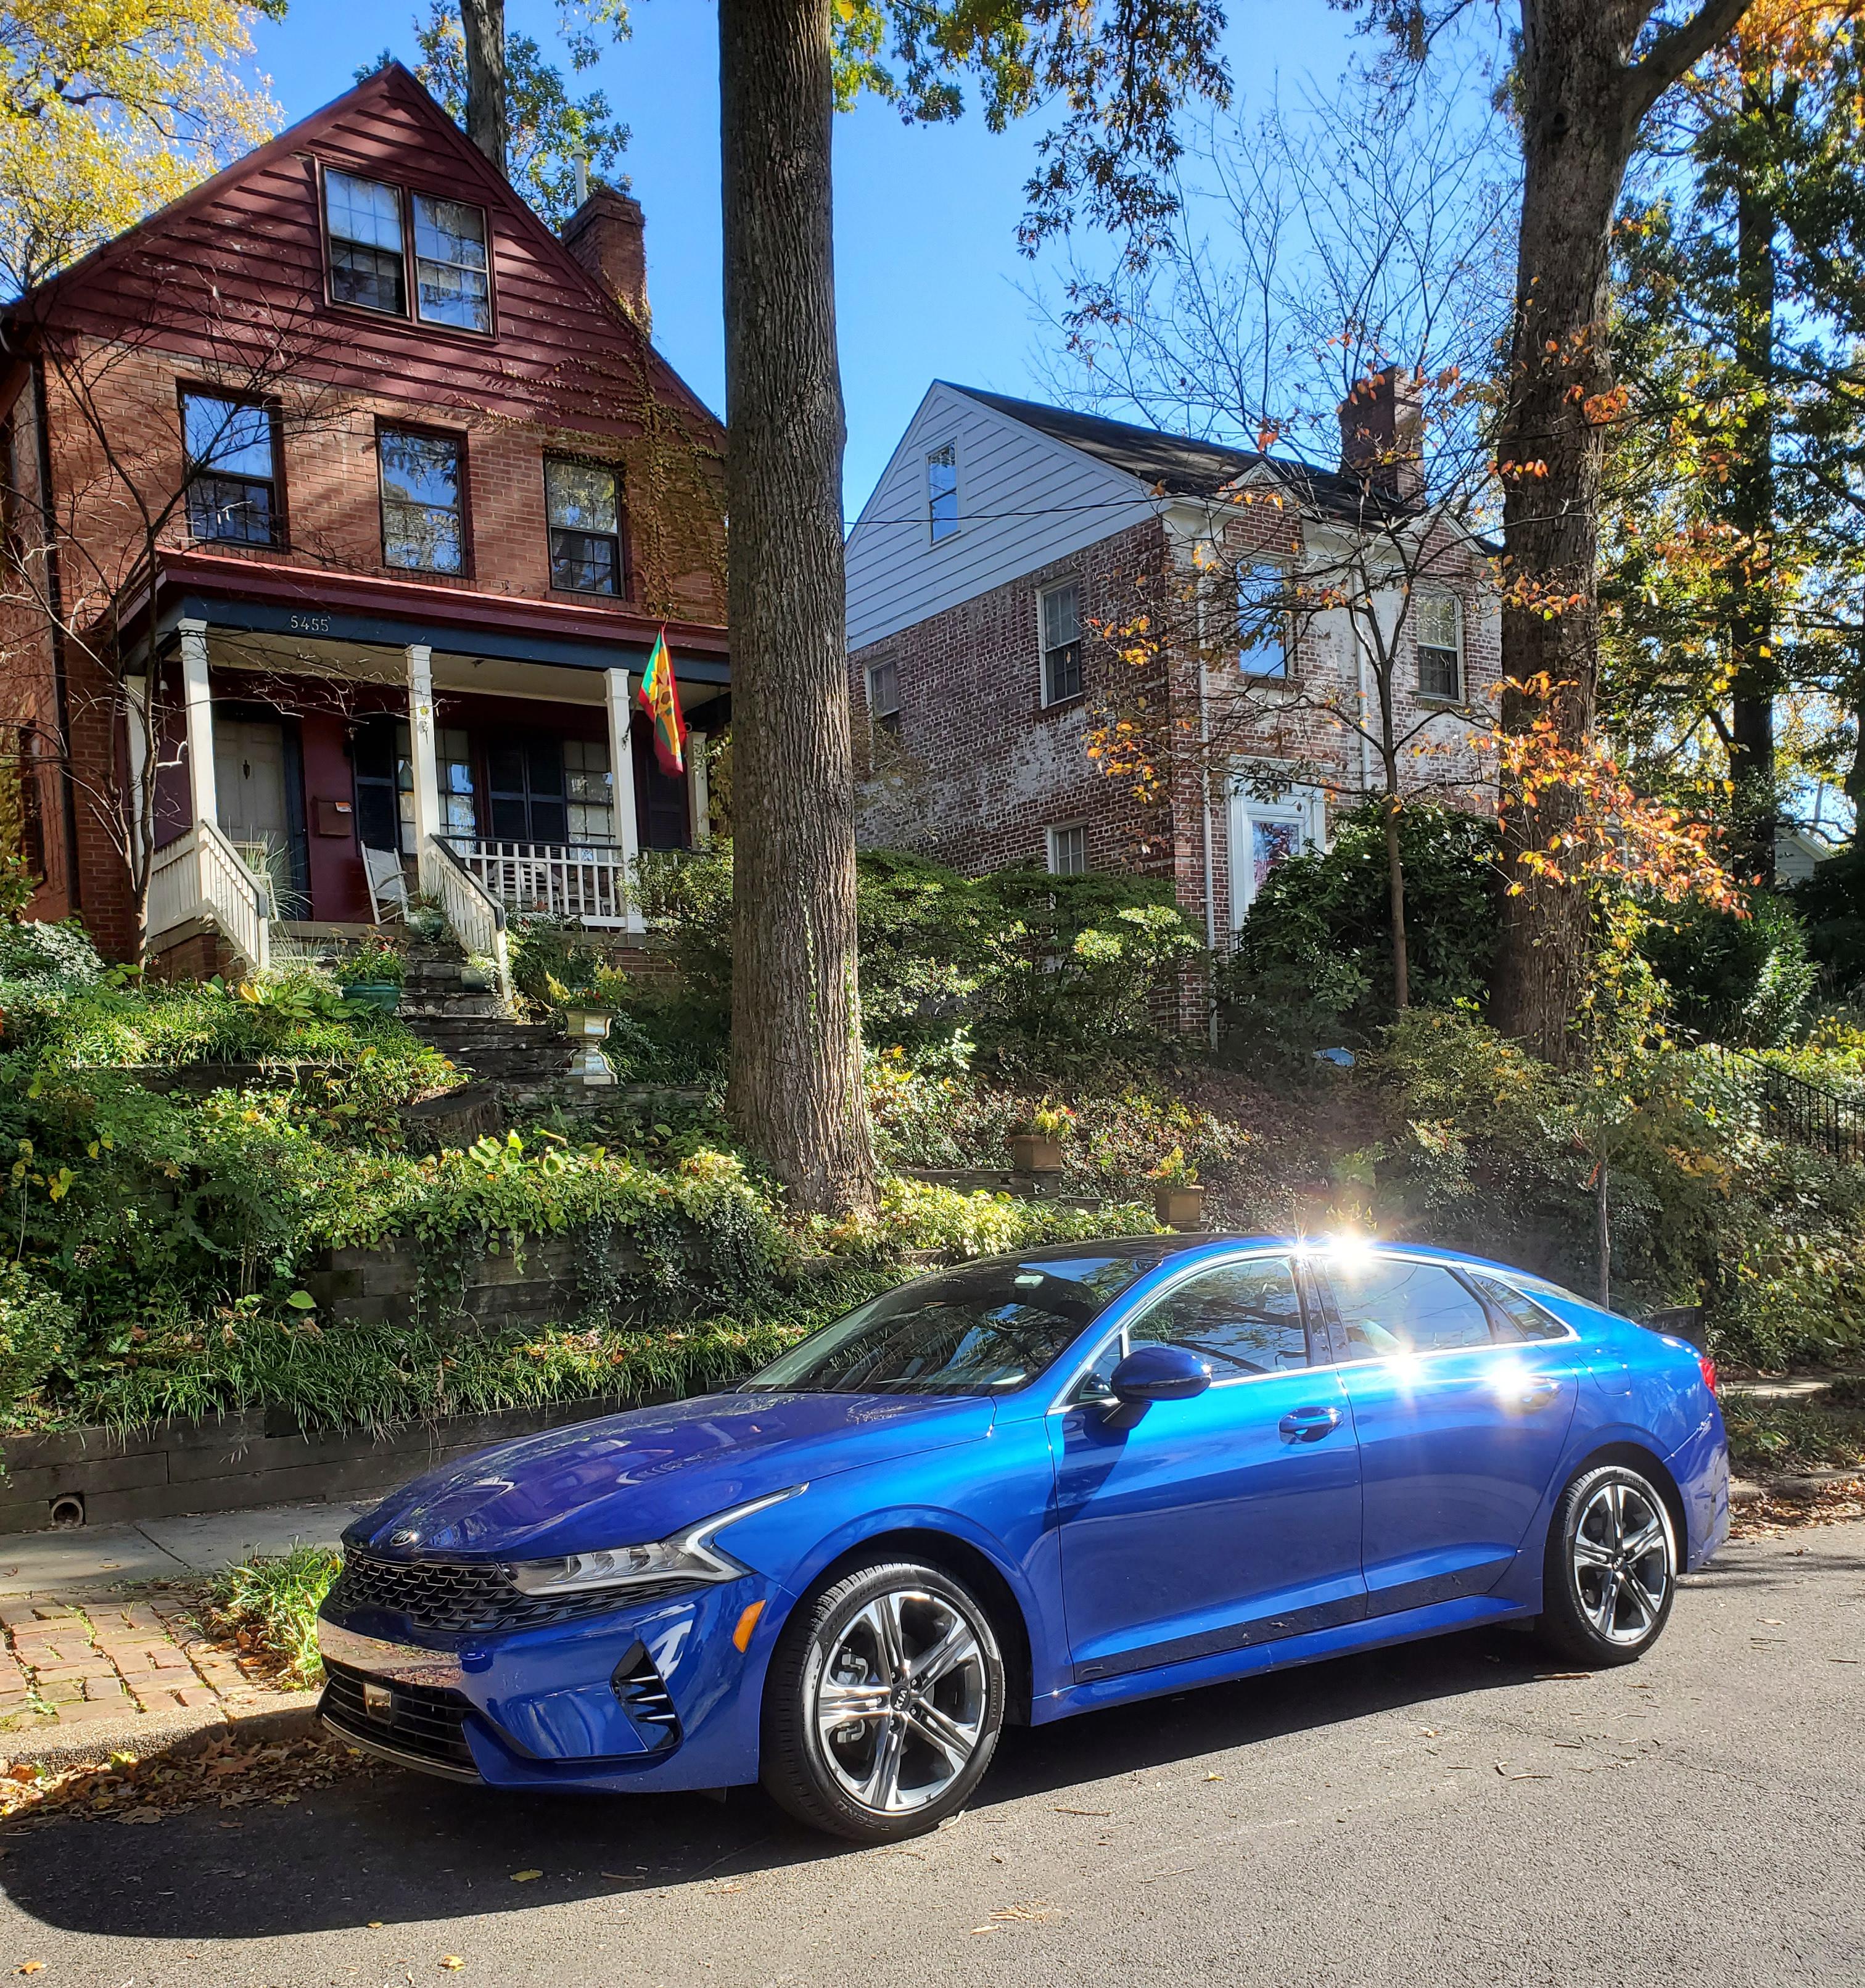 2021 Kia K5 LXS in Sapphire Blue in NW Washington DC